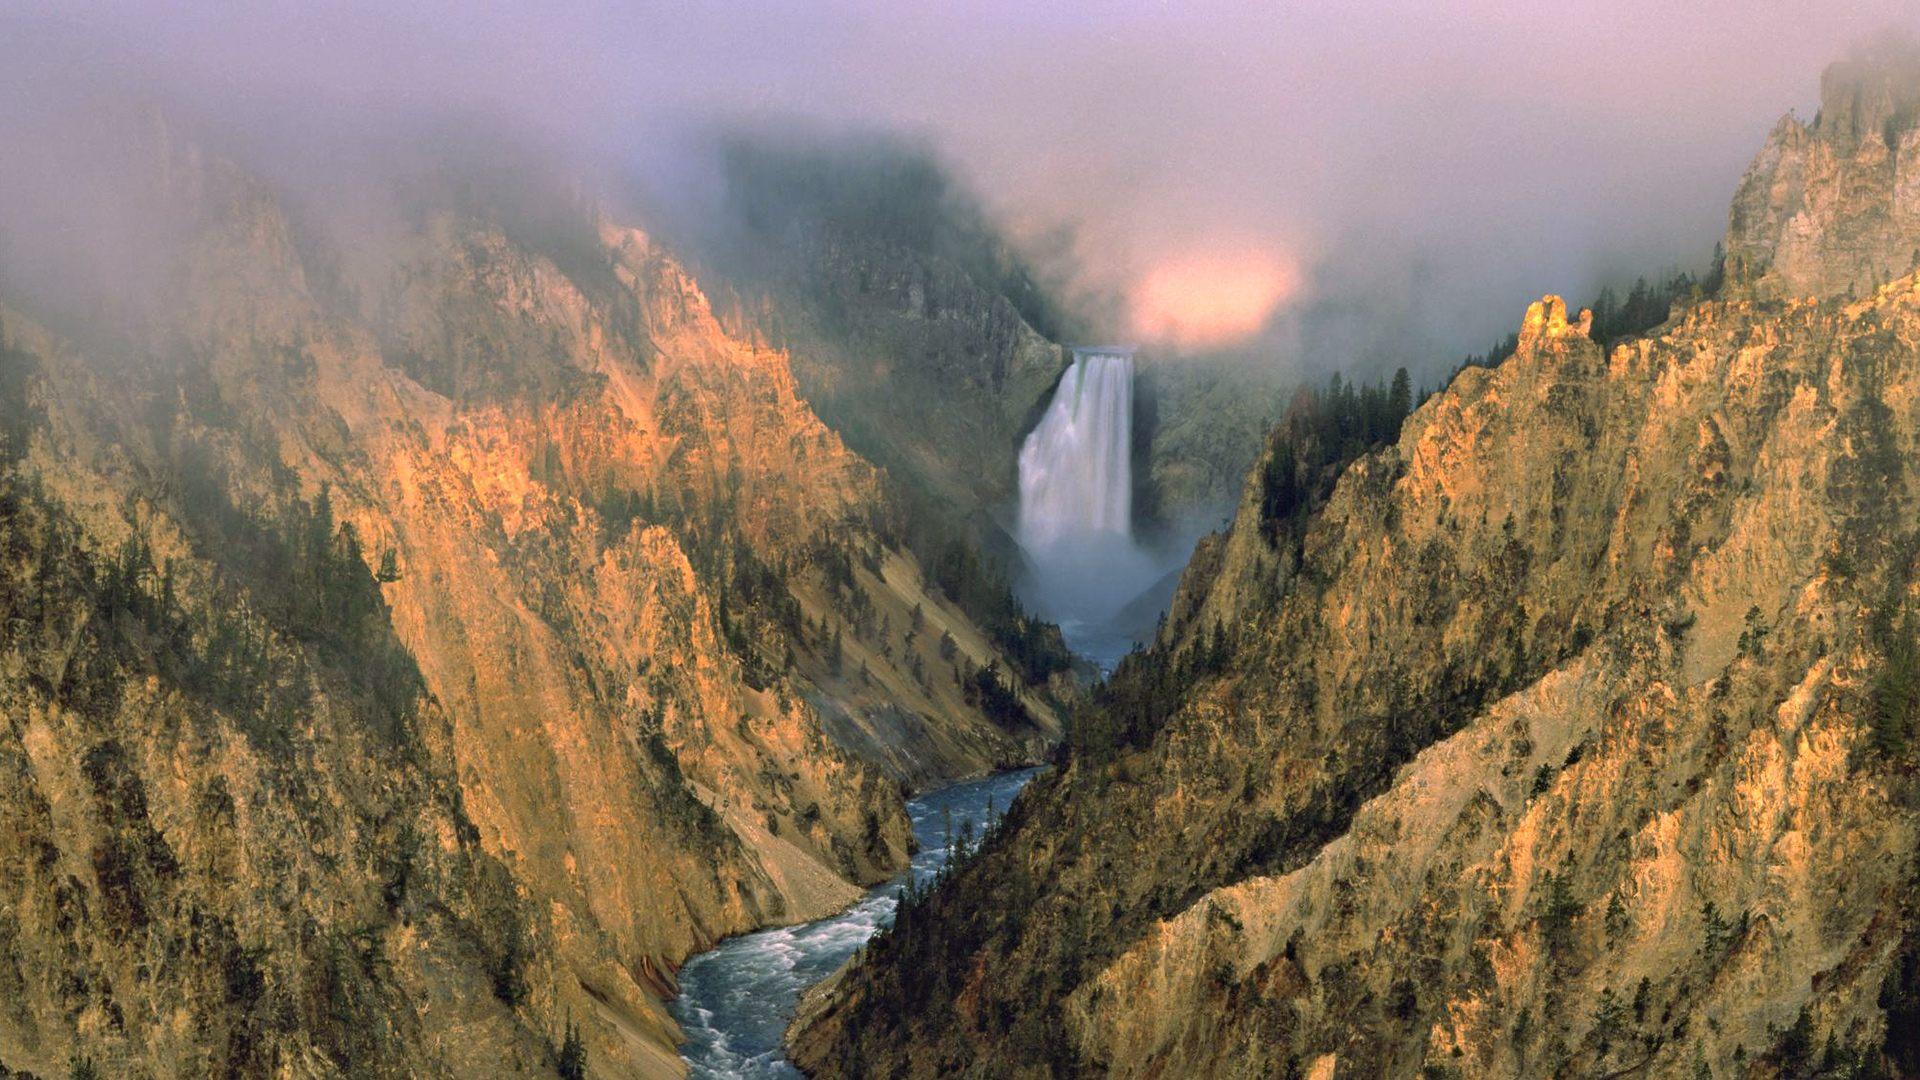 In Yellowstone National Park Hd 11334 Wallpaper Wallpaper hd 1920x1080